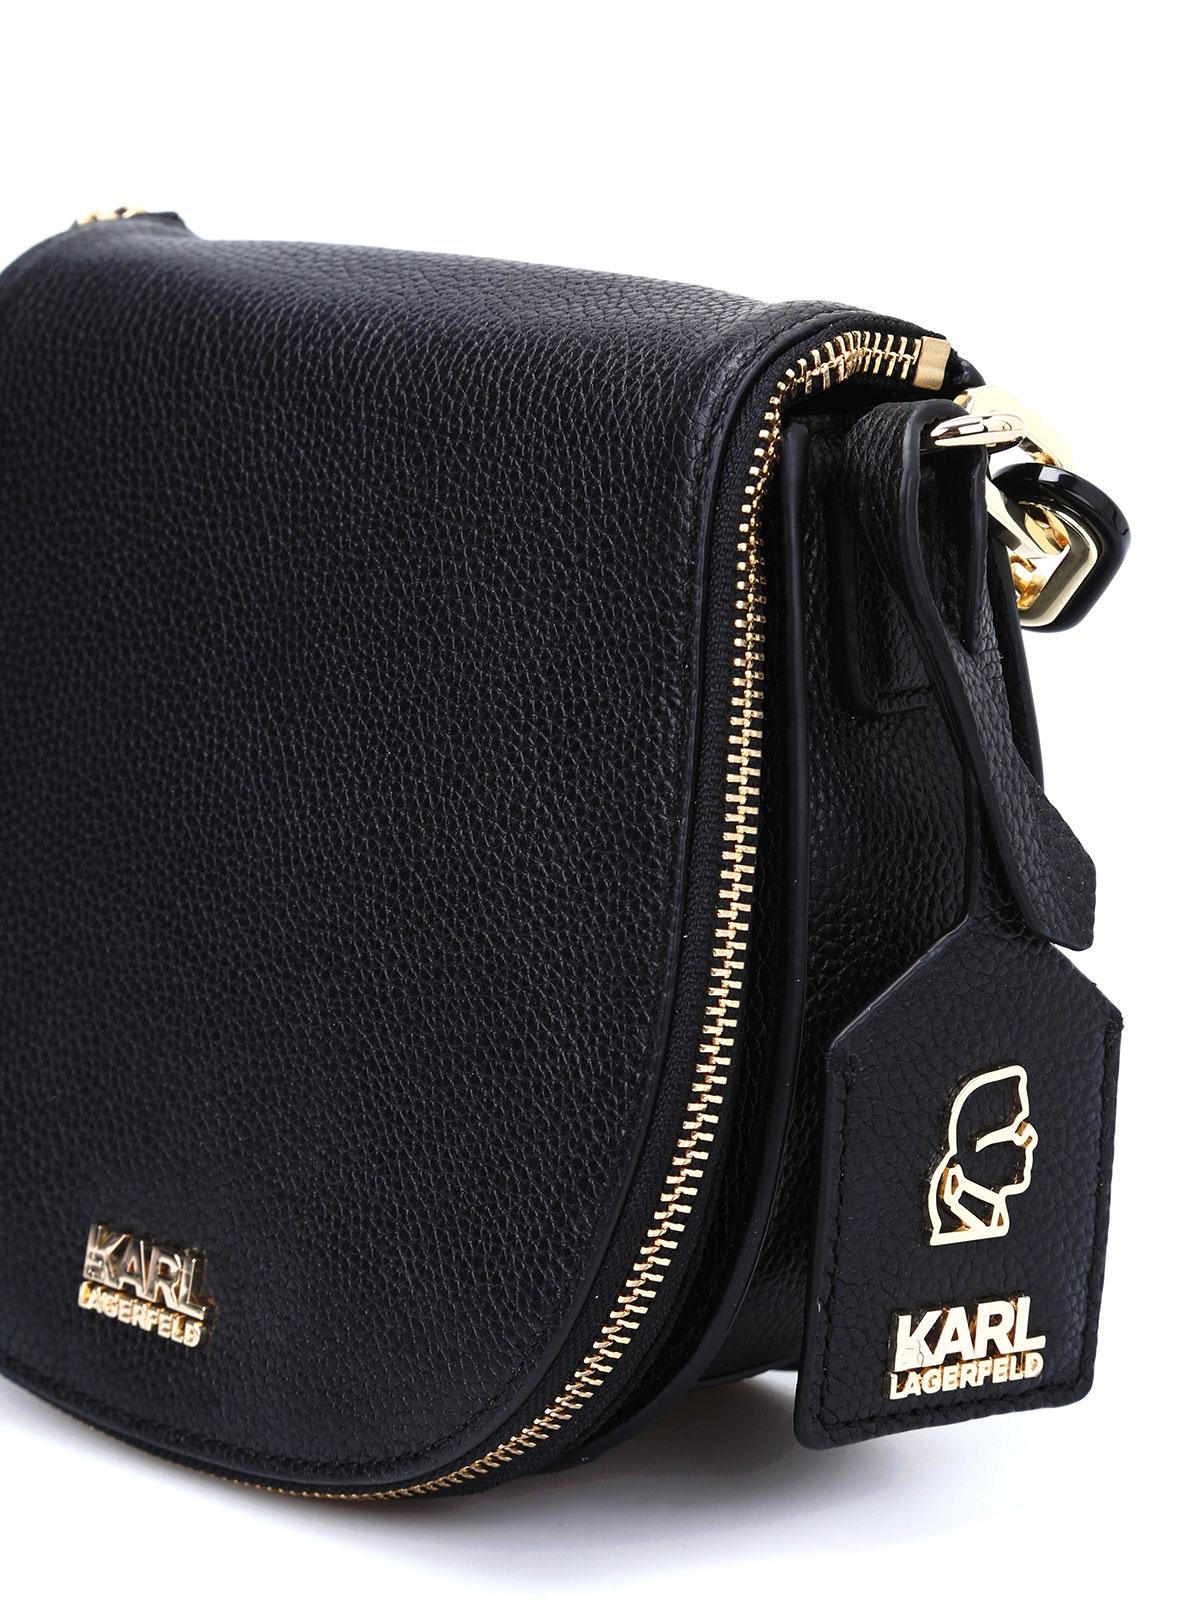 ee83a3e10e33b Karl Lagerfeld - Sac Bandoulière K Grainy Pour Femme - Sacs ...